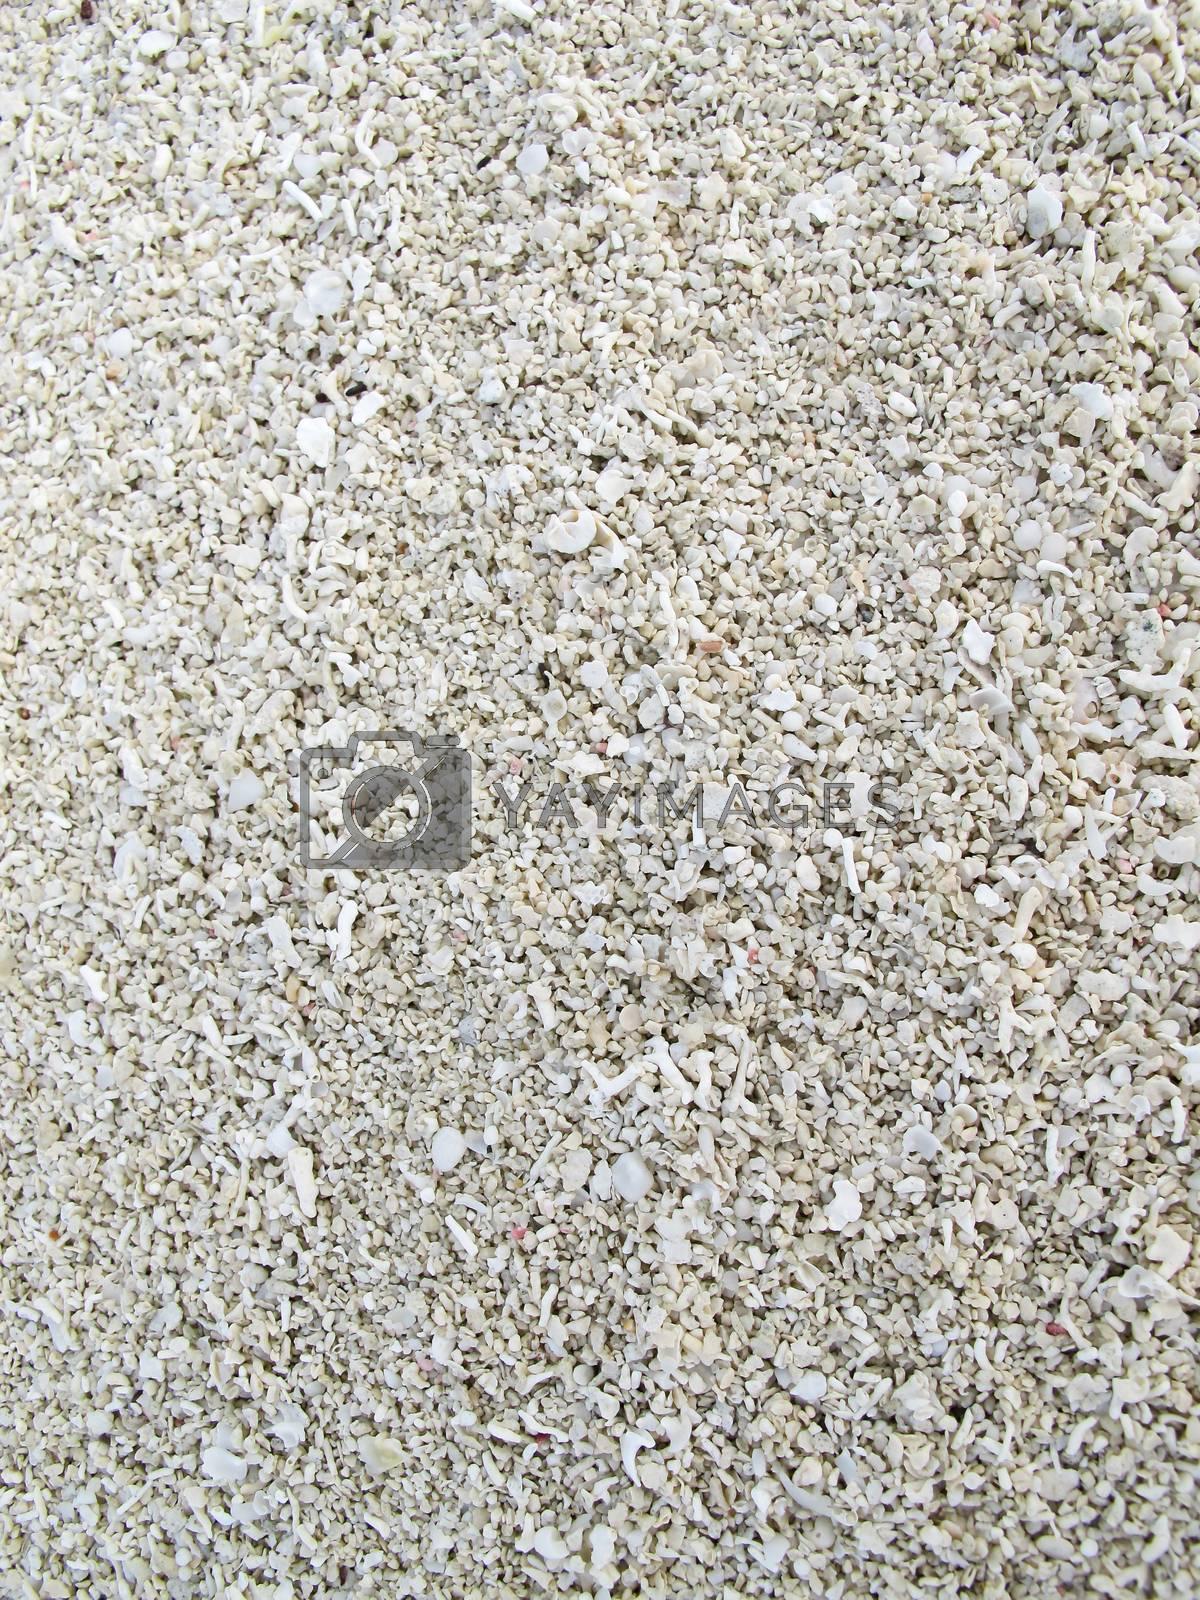 The white sand on the beach